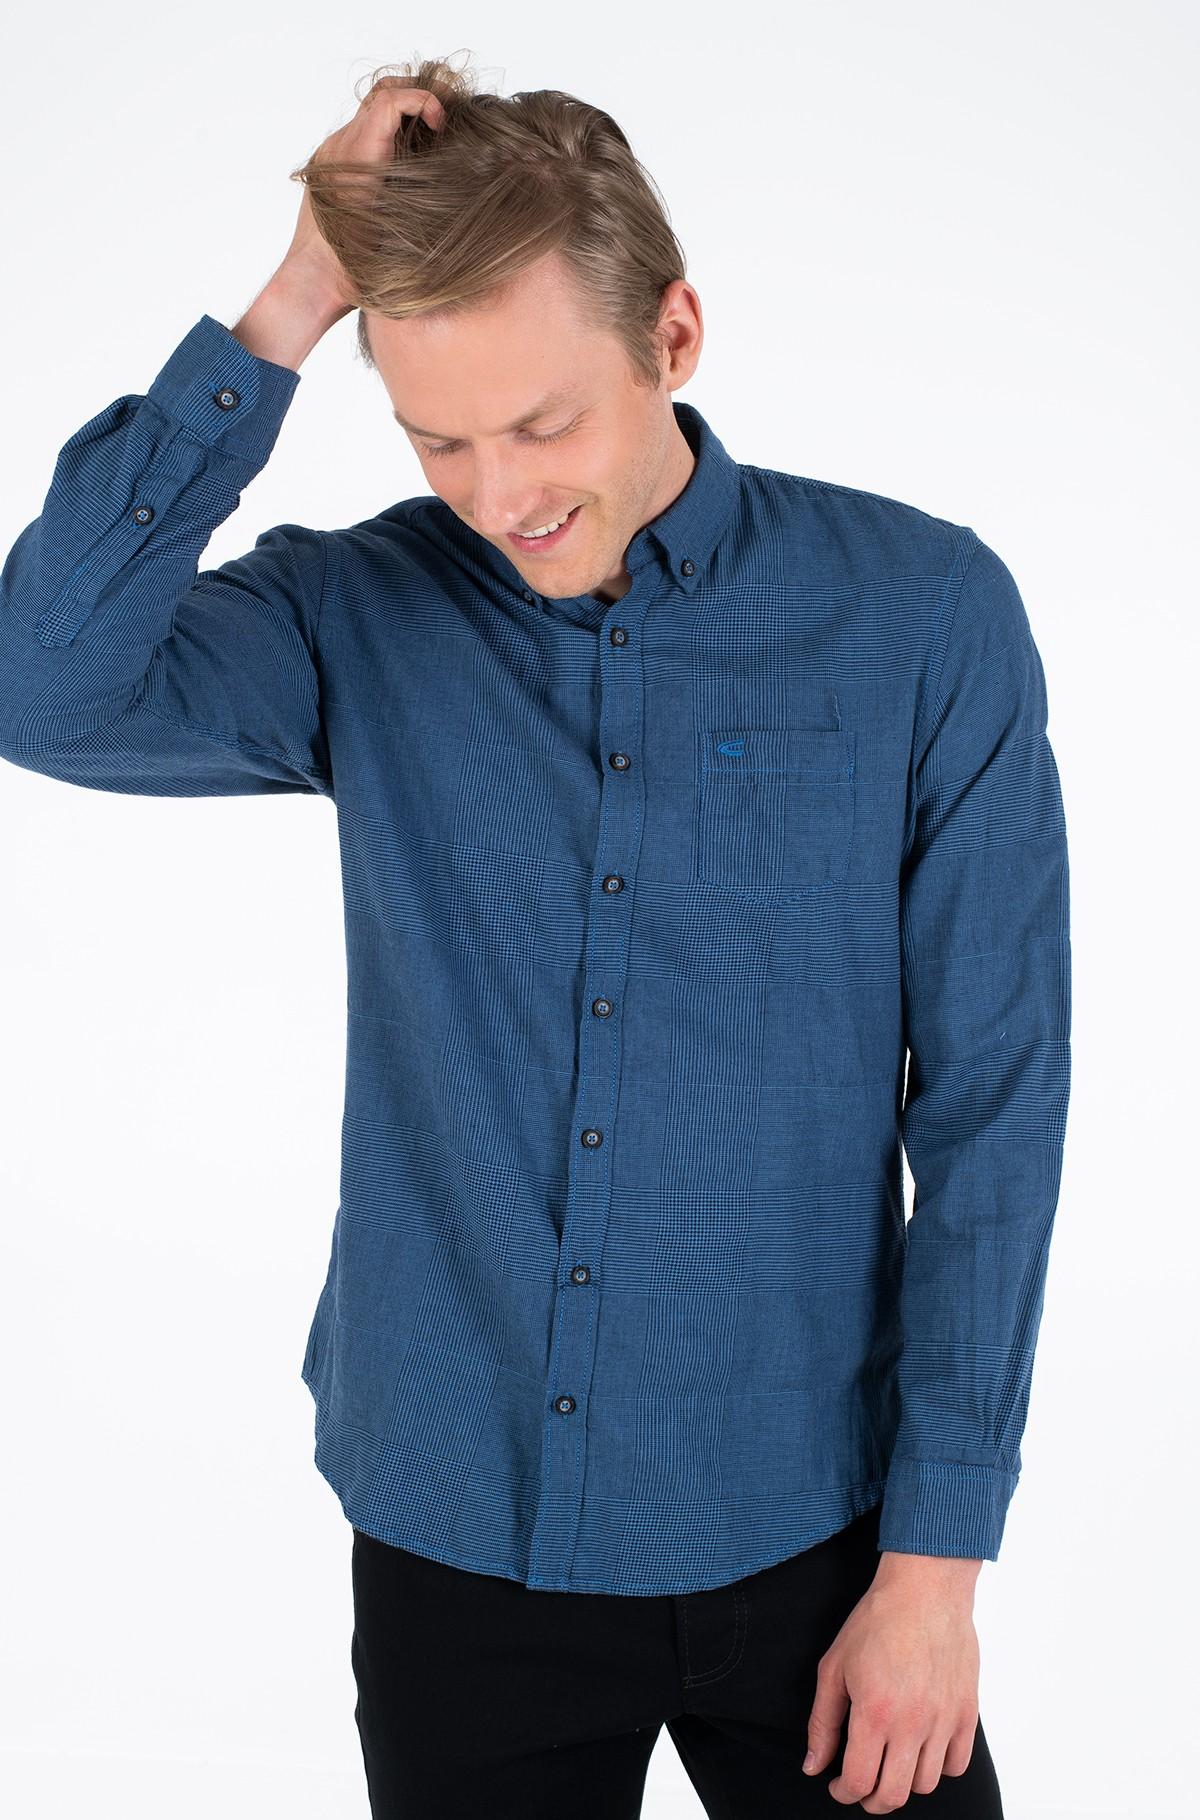 Marškiniai 409101/3S22-full-1